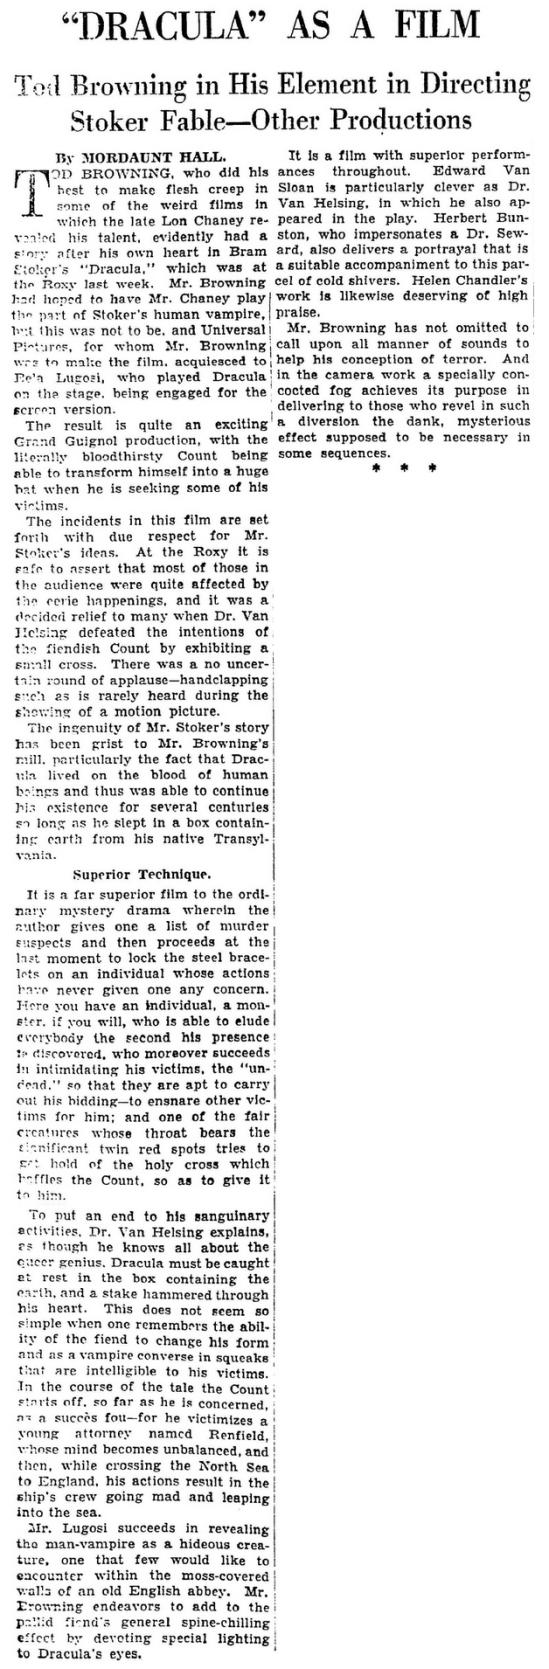 Dracula, The New York Times,February 22 1931